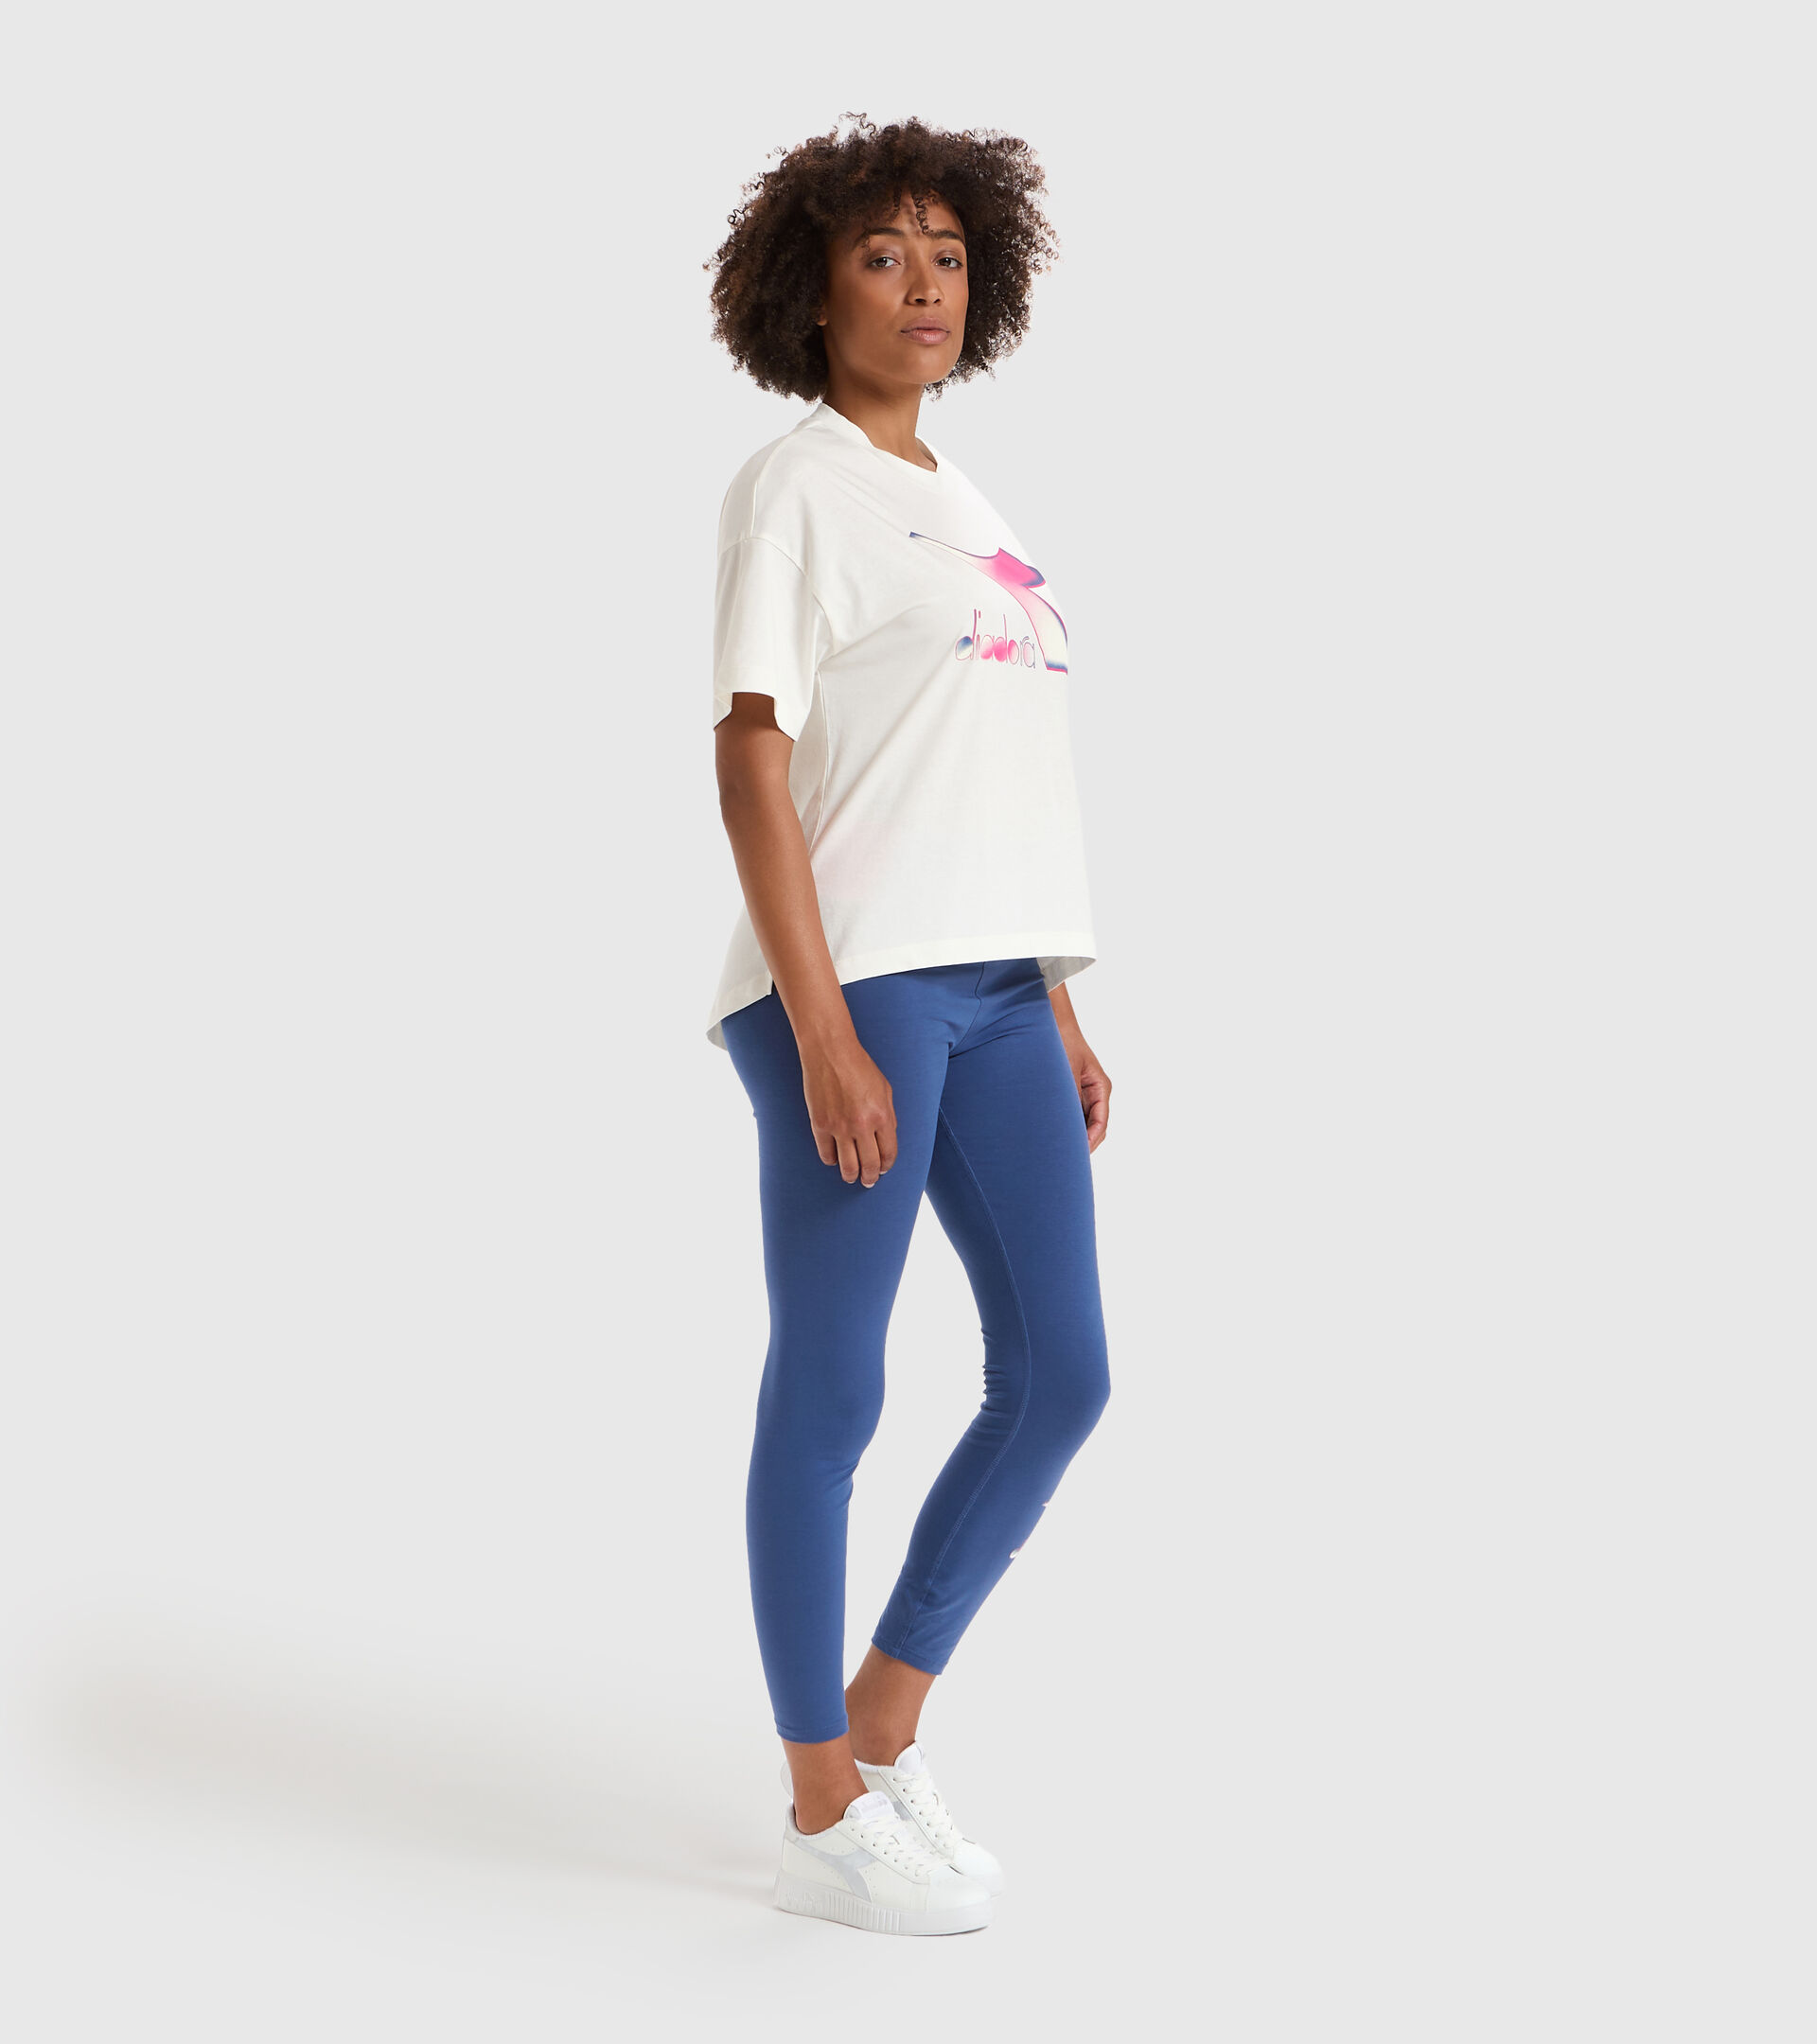 Camiseta - Mujer L.T-SHIRT SS LUSH BLANCO MURMURAR - Diadora